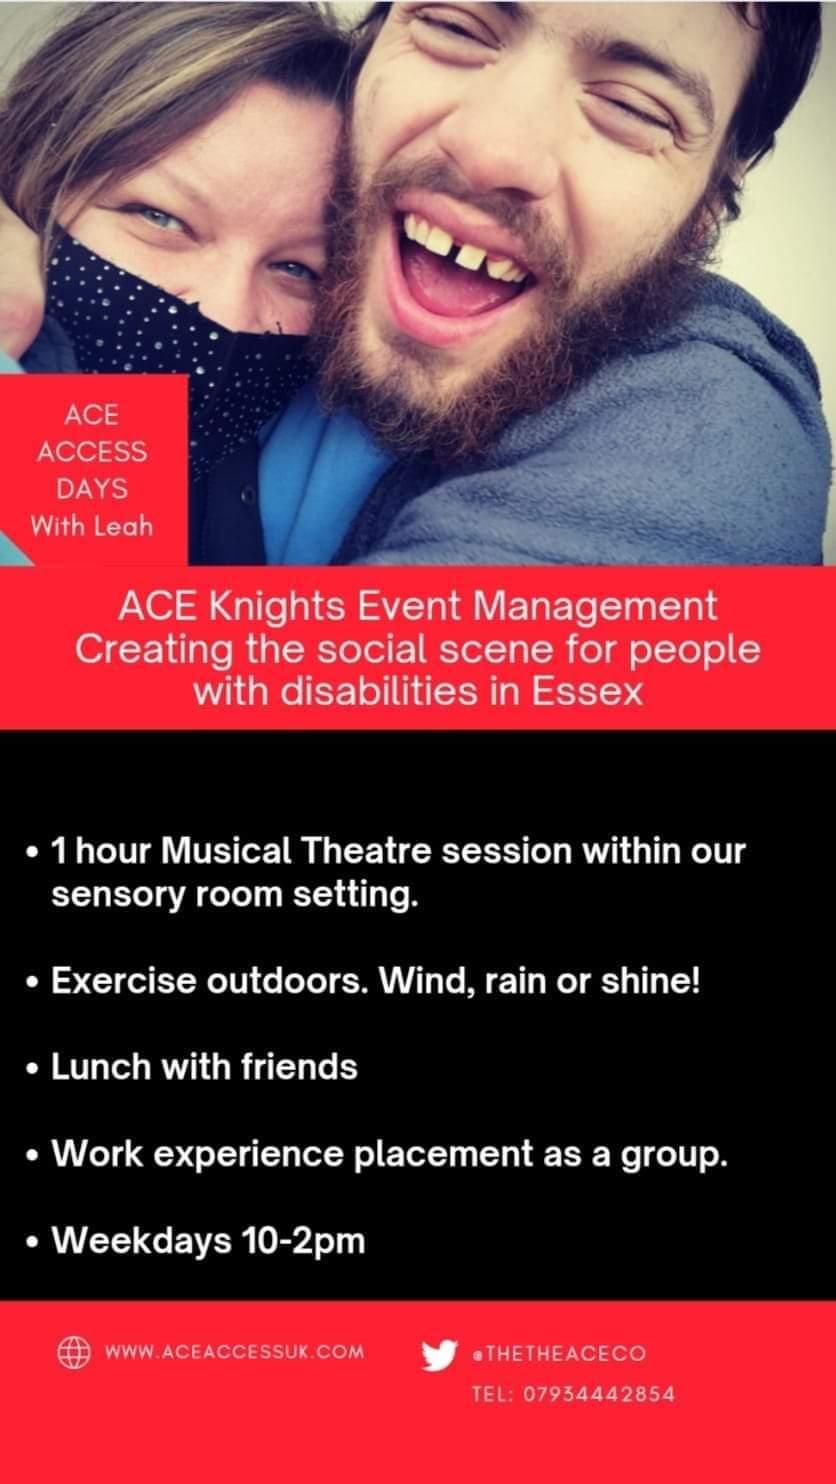 ACE Access days! 1